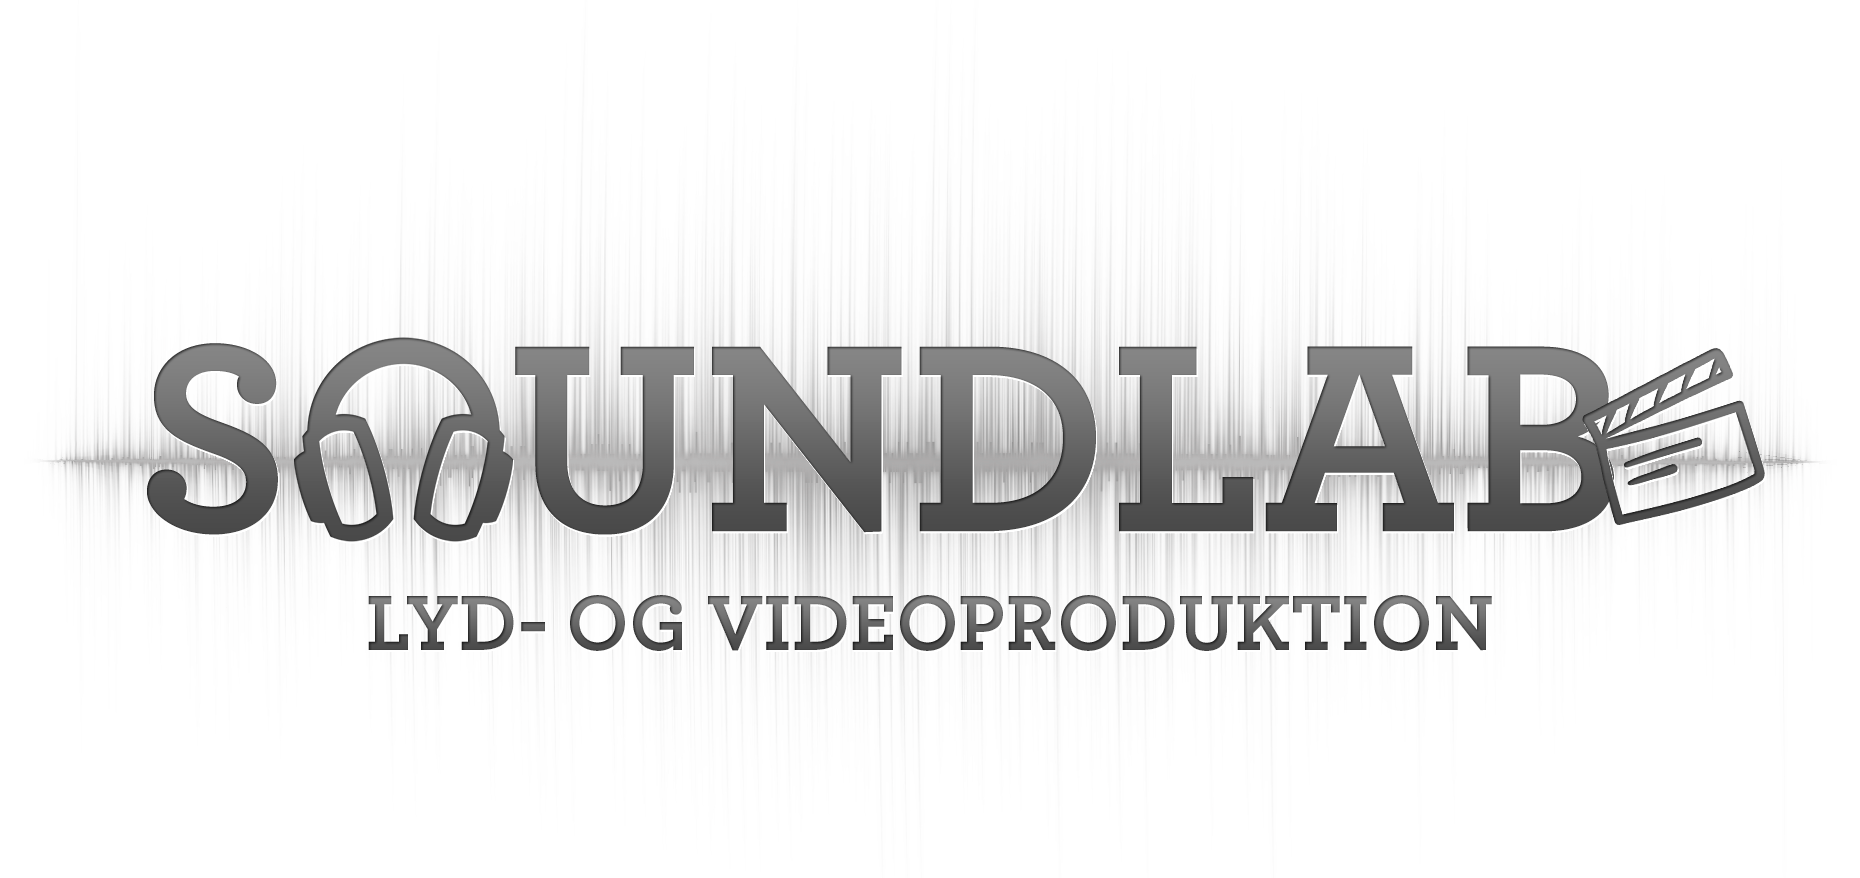 lydcase, videocase, lydproduktion, videoproduktion, lyddesign, lydlogo, lyde, undervisning lyd, lydshop, lydbranding